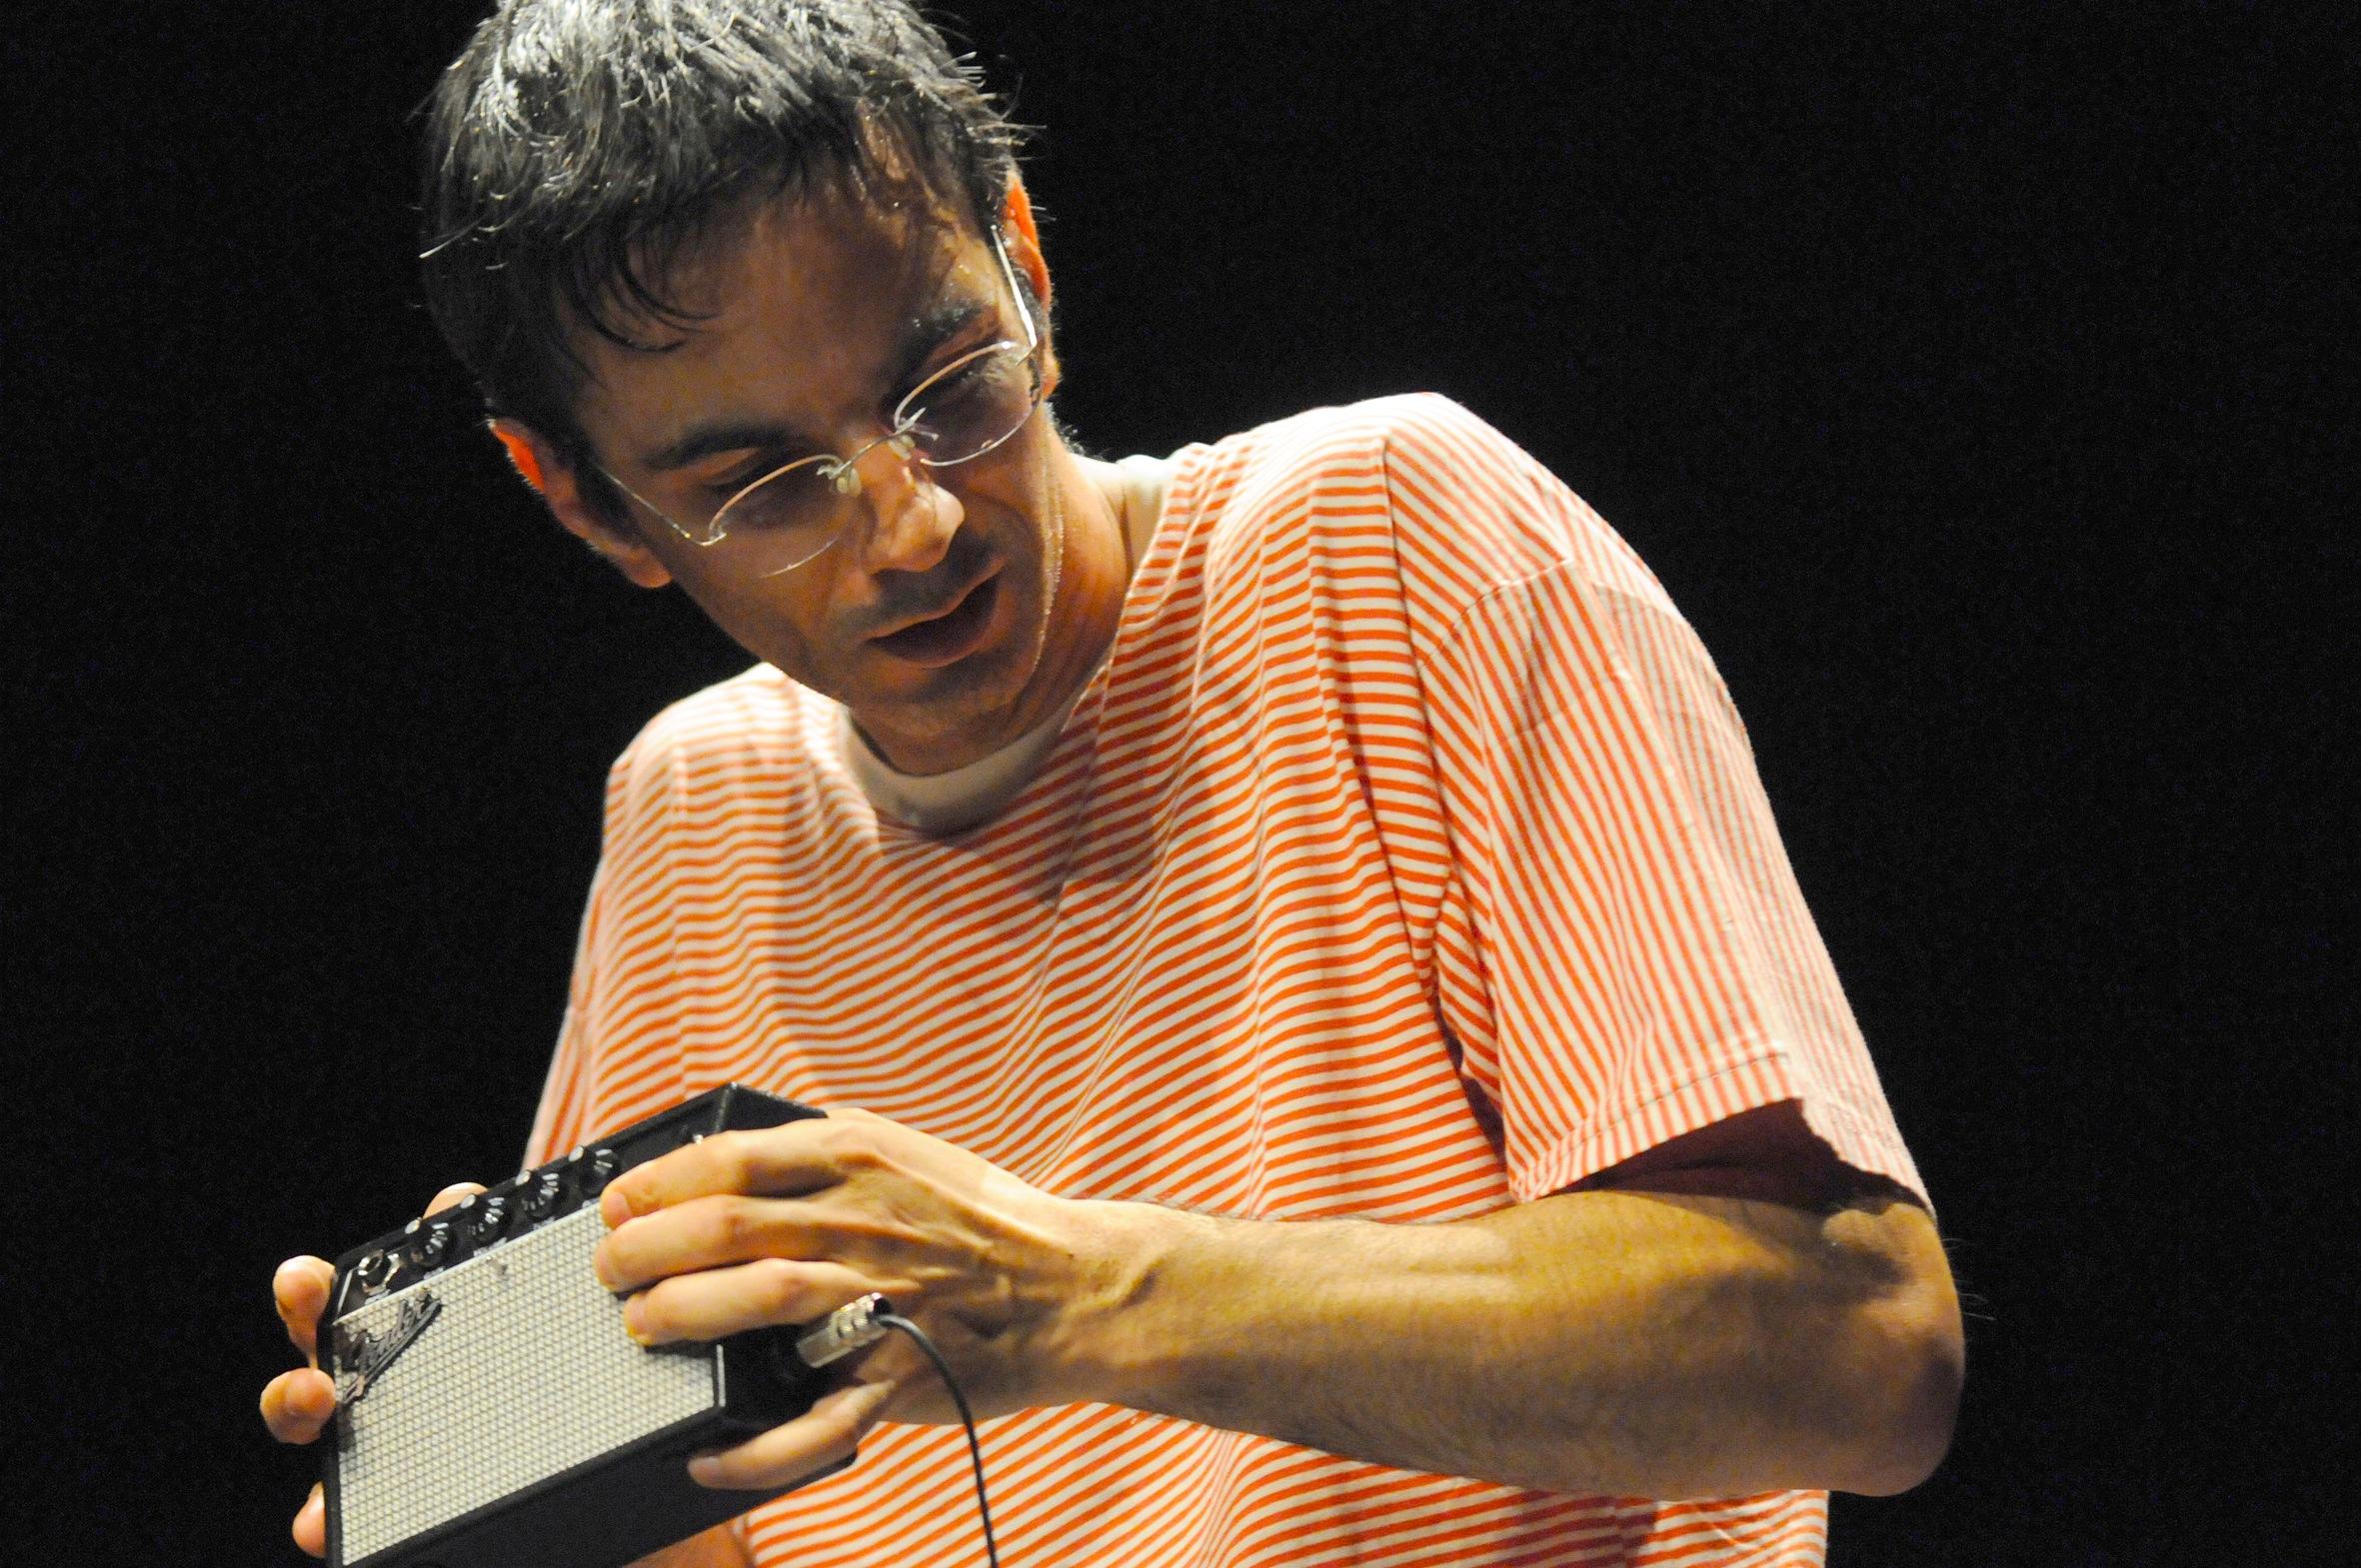 Rafael Toral, photo by Nuno Martins